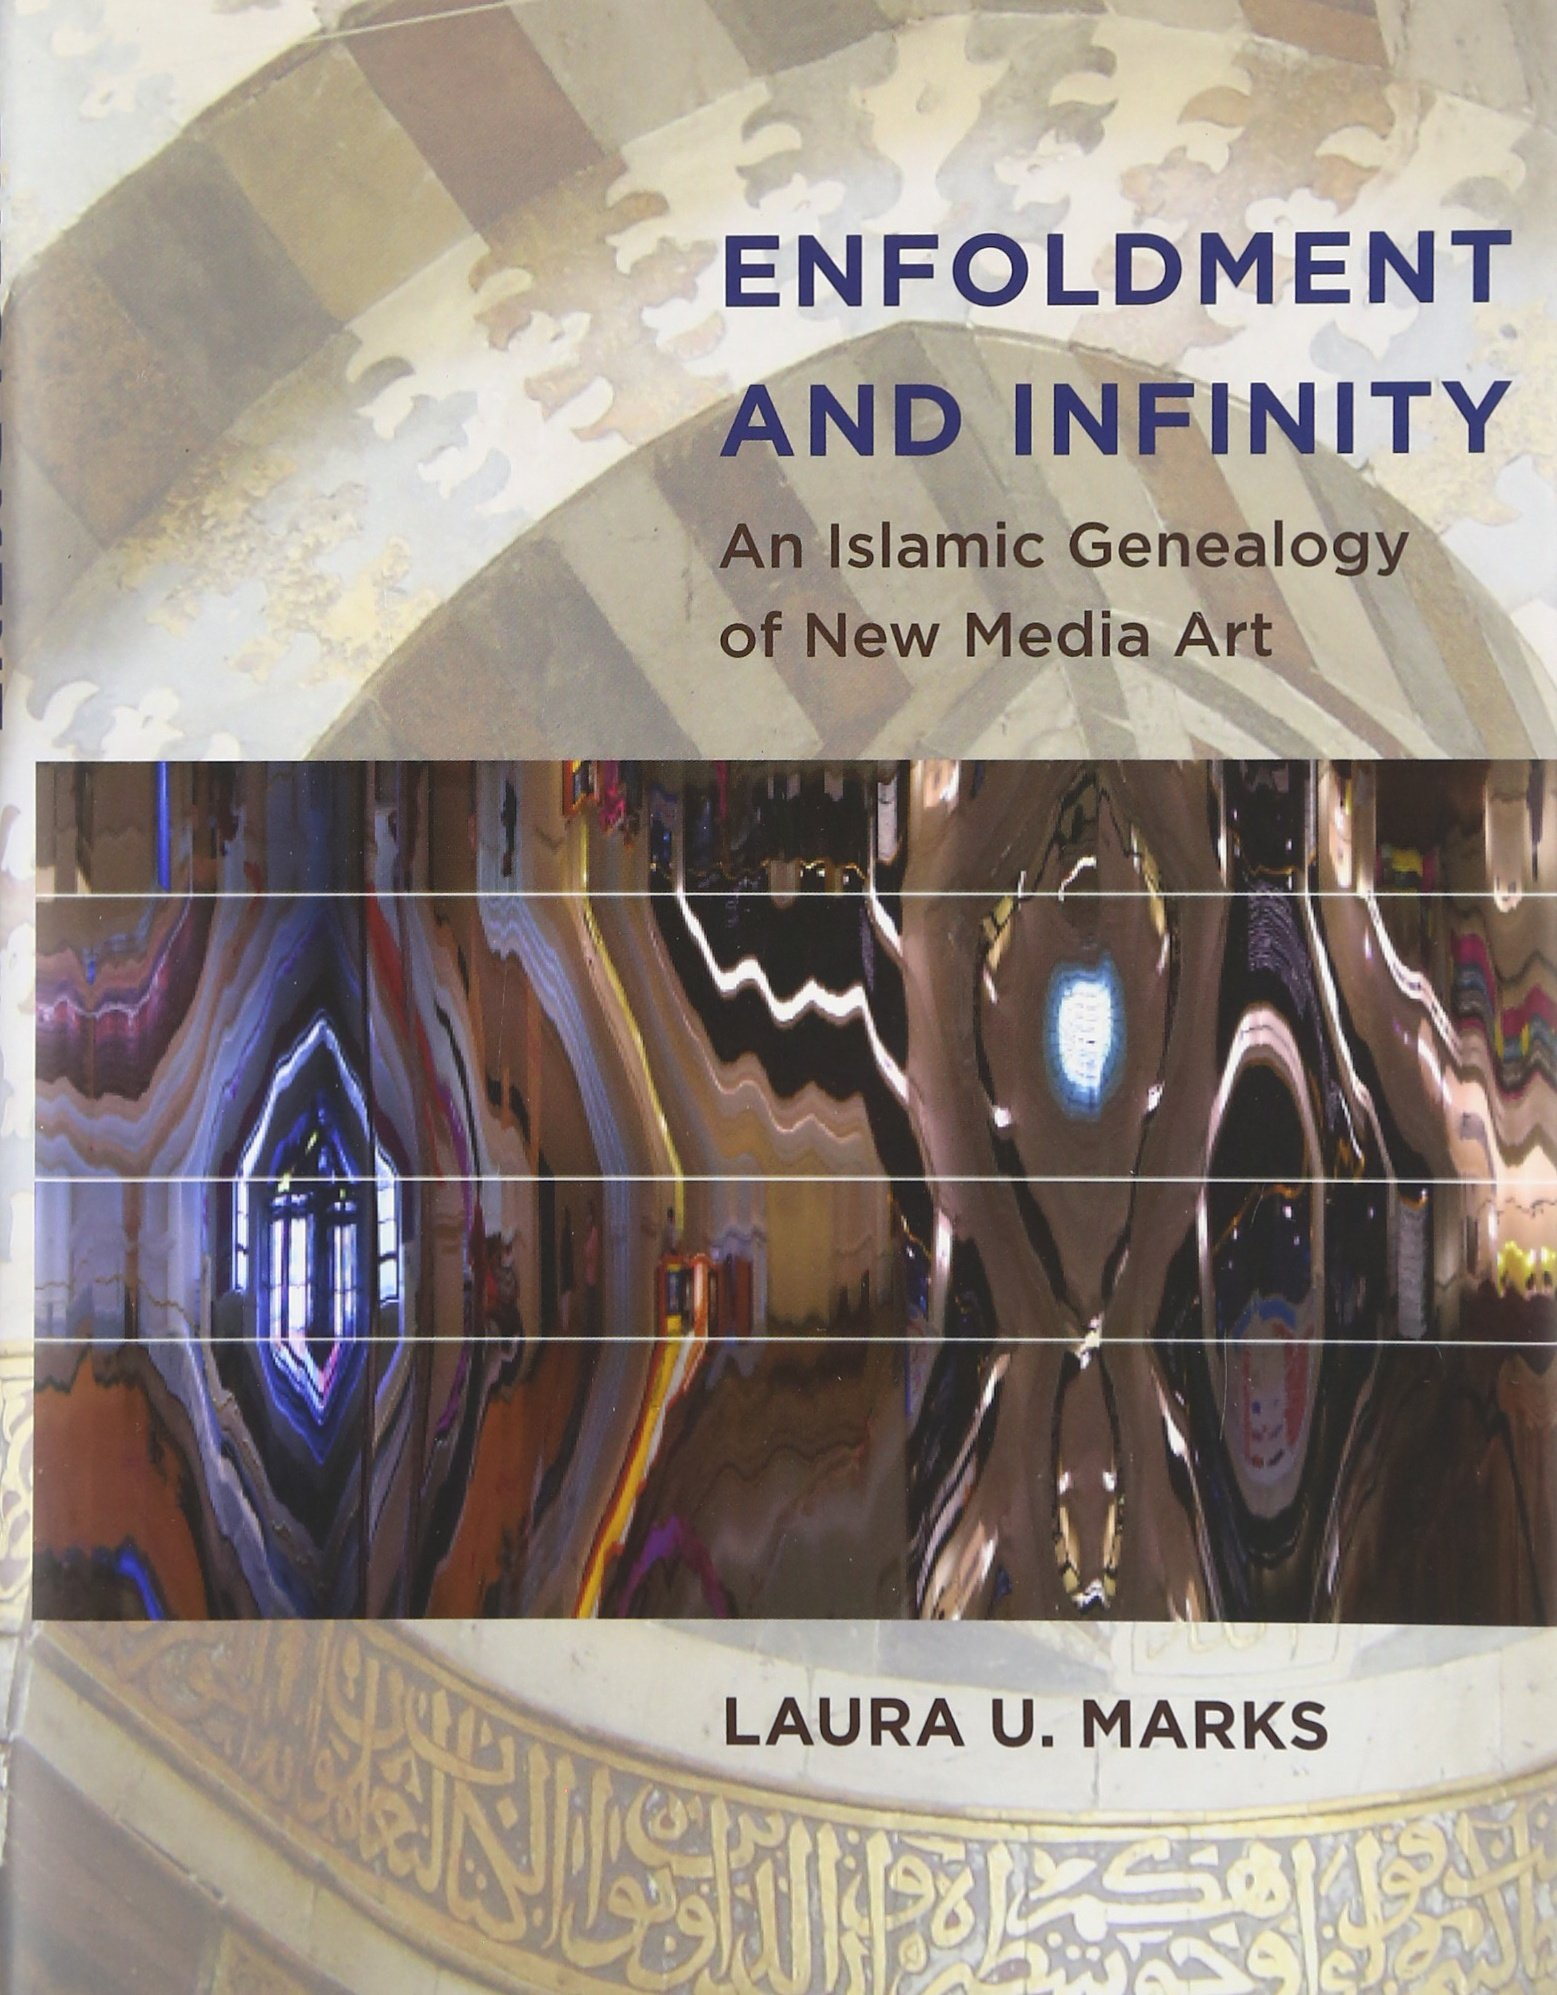 Buy Enfoldment and Infinity: An Islamic Genealogy of New Media Art